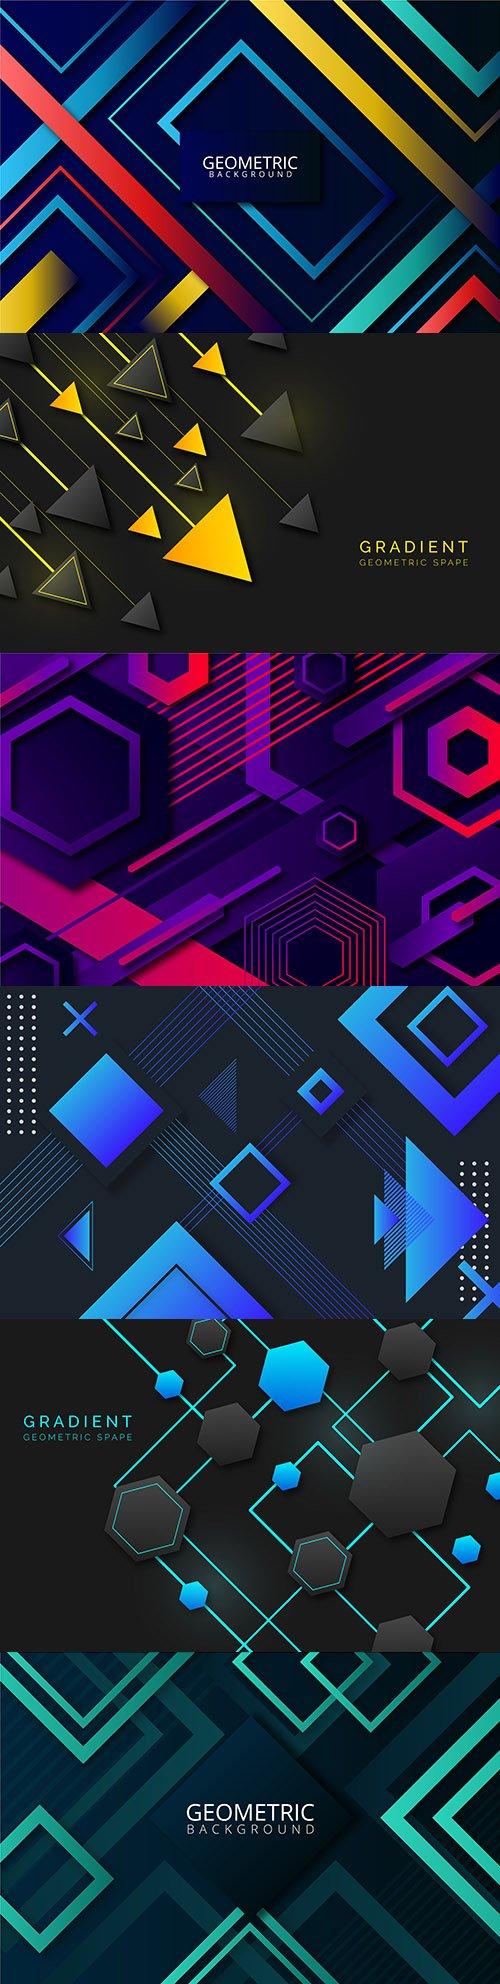 Bright geometrical modern background gradient 3